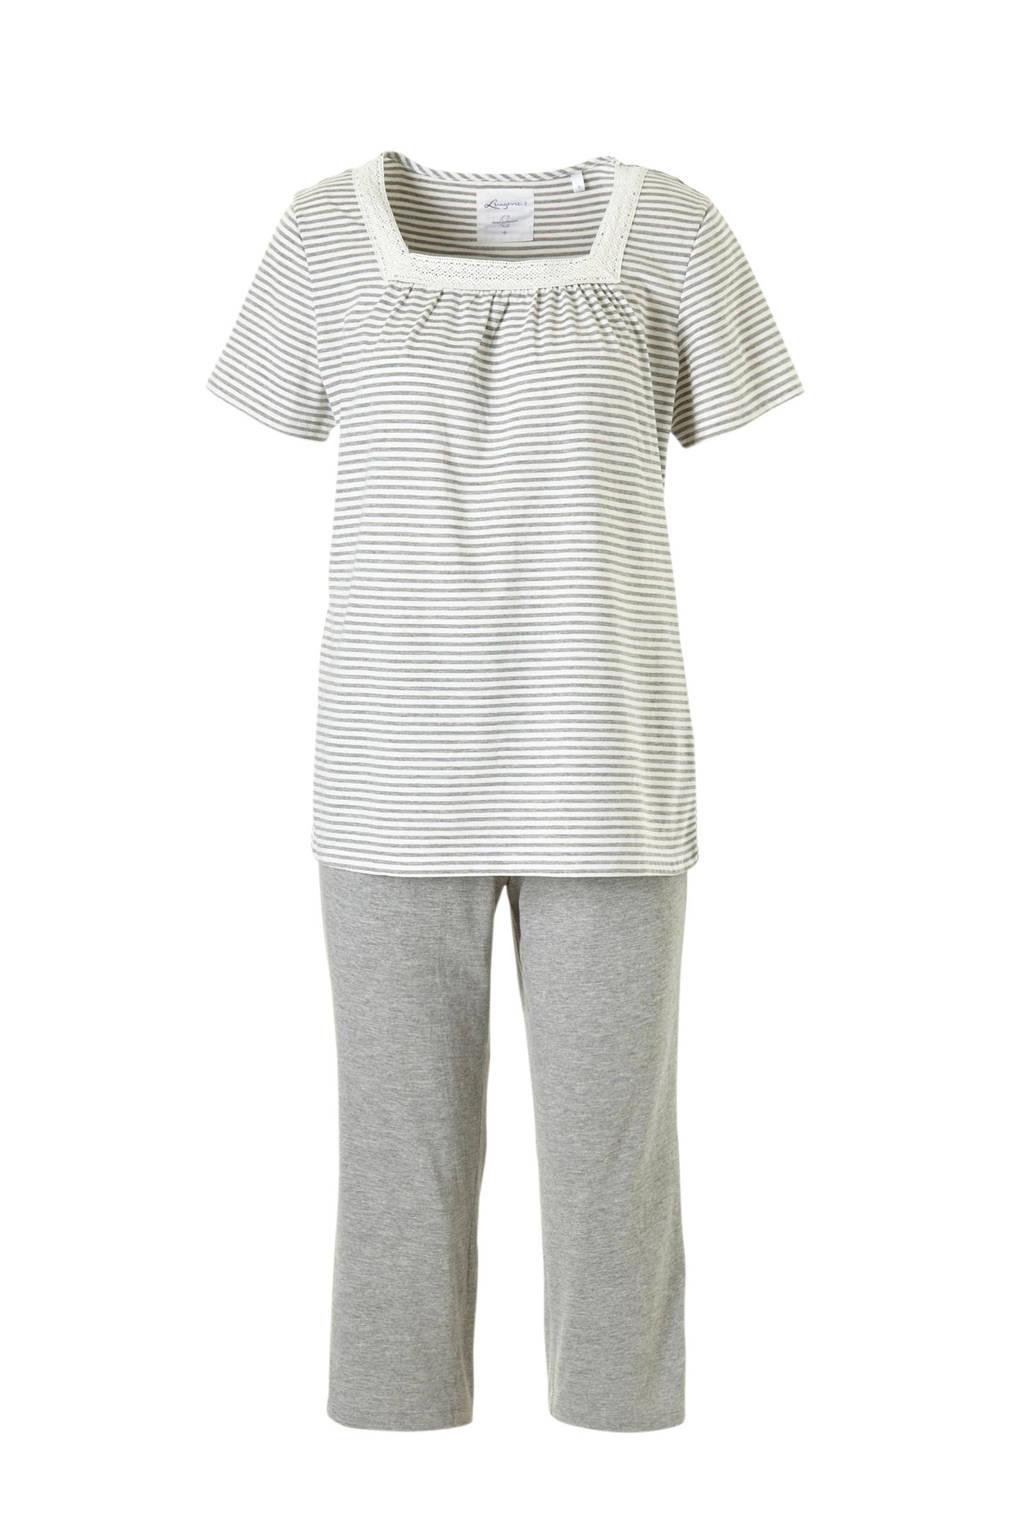 C&A Lingerie pyjama grijs, Stripe9AMdGray